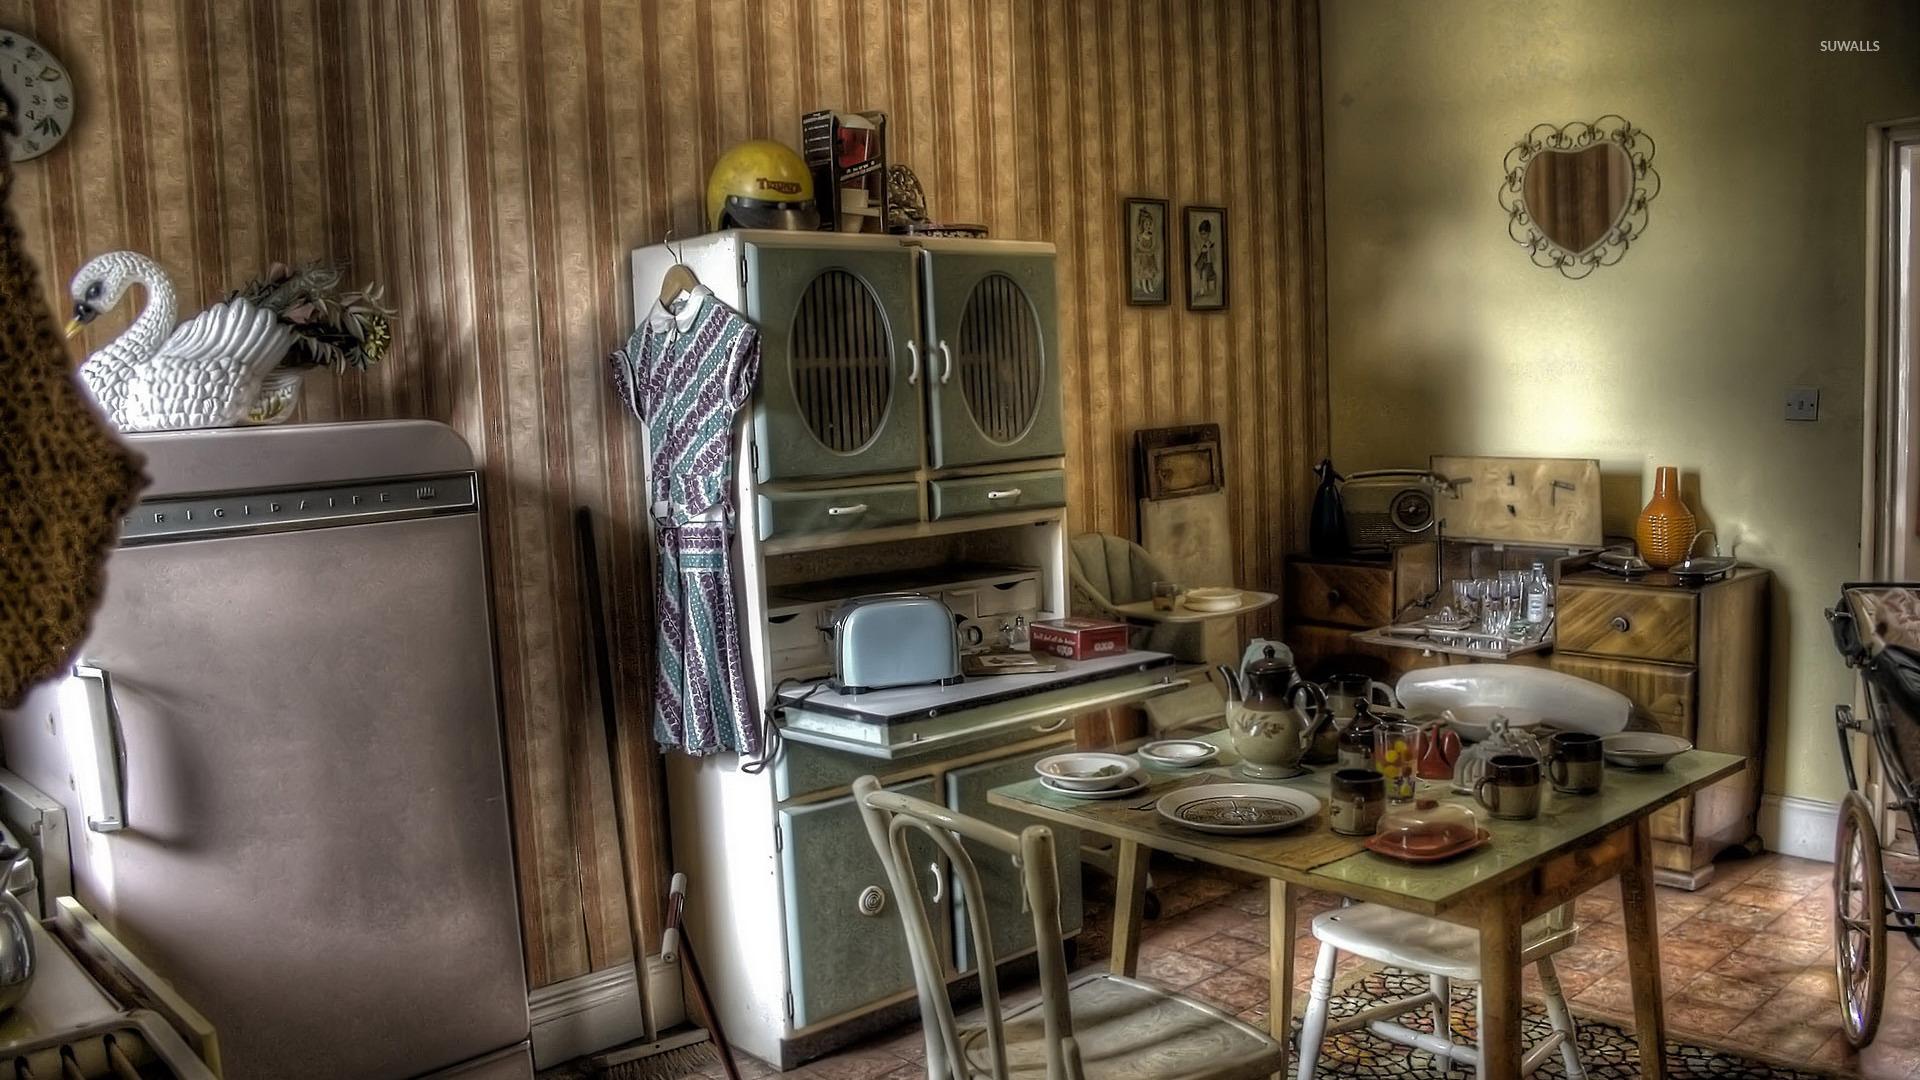 Free Fall Desktop Wallpaper Downloads Vintage Kitchen 2 Wallpaper Photography Wallpapers